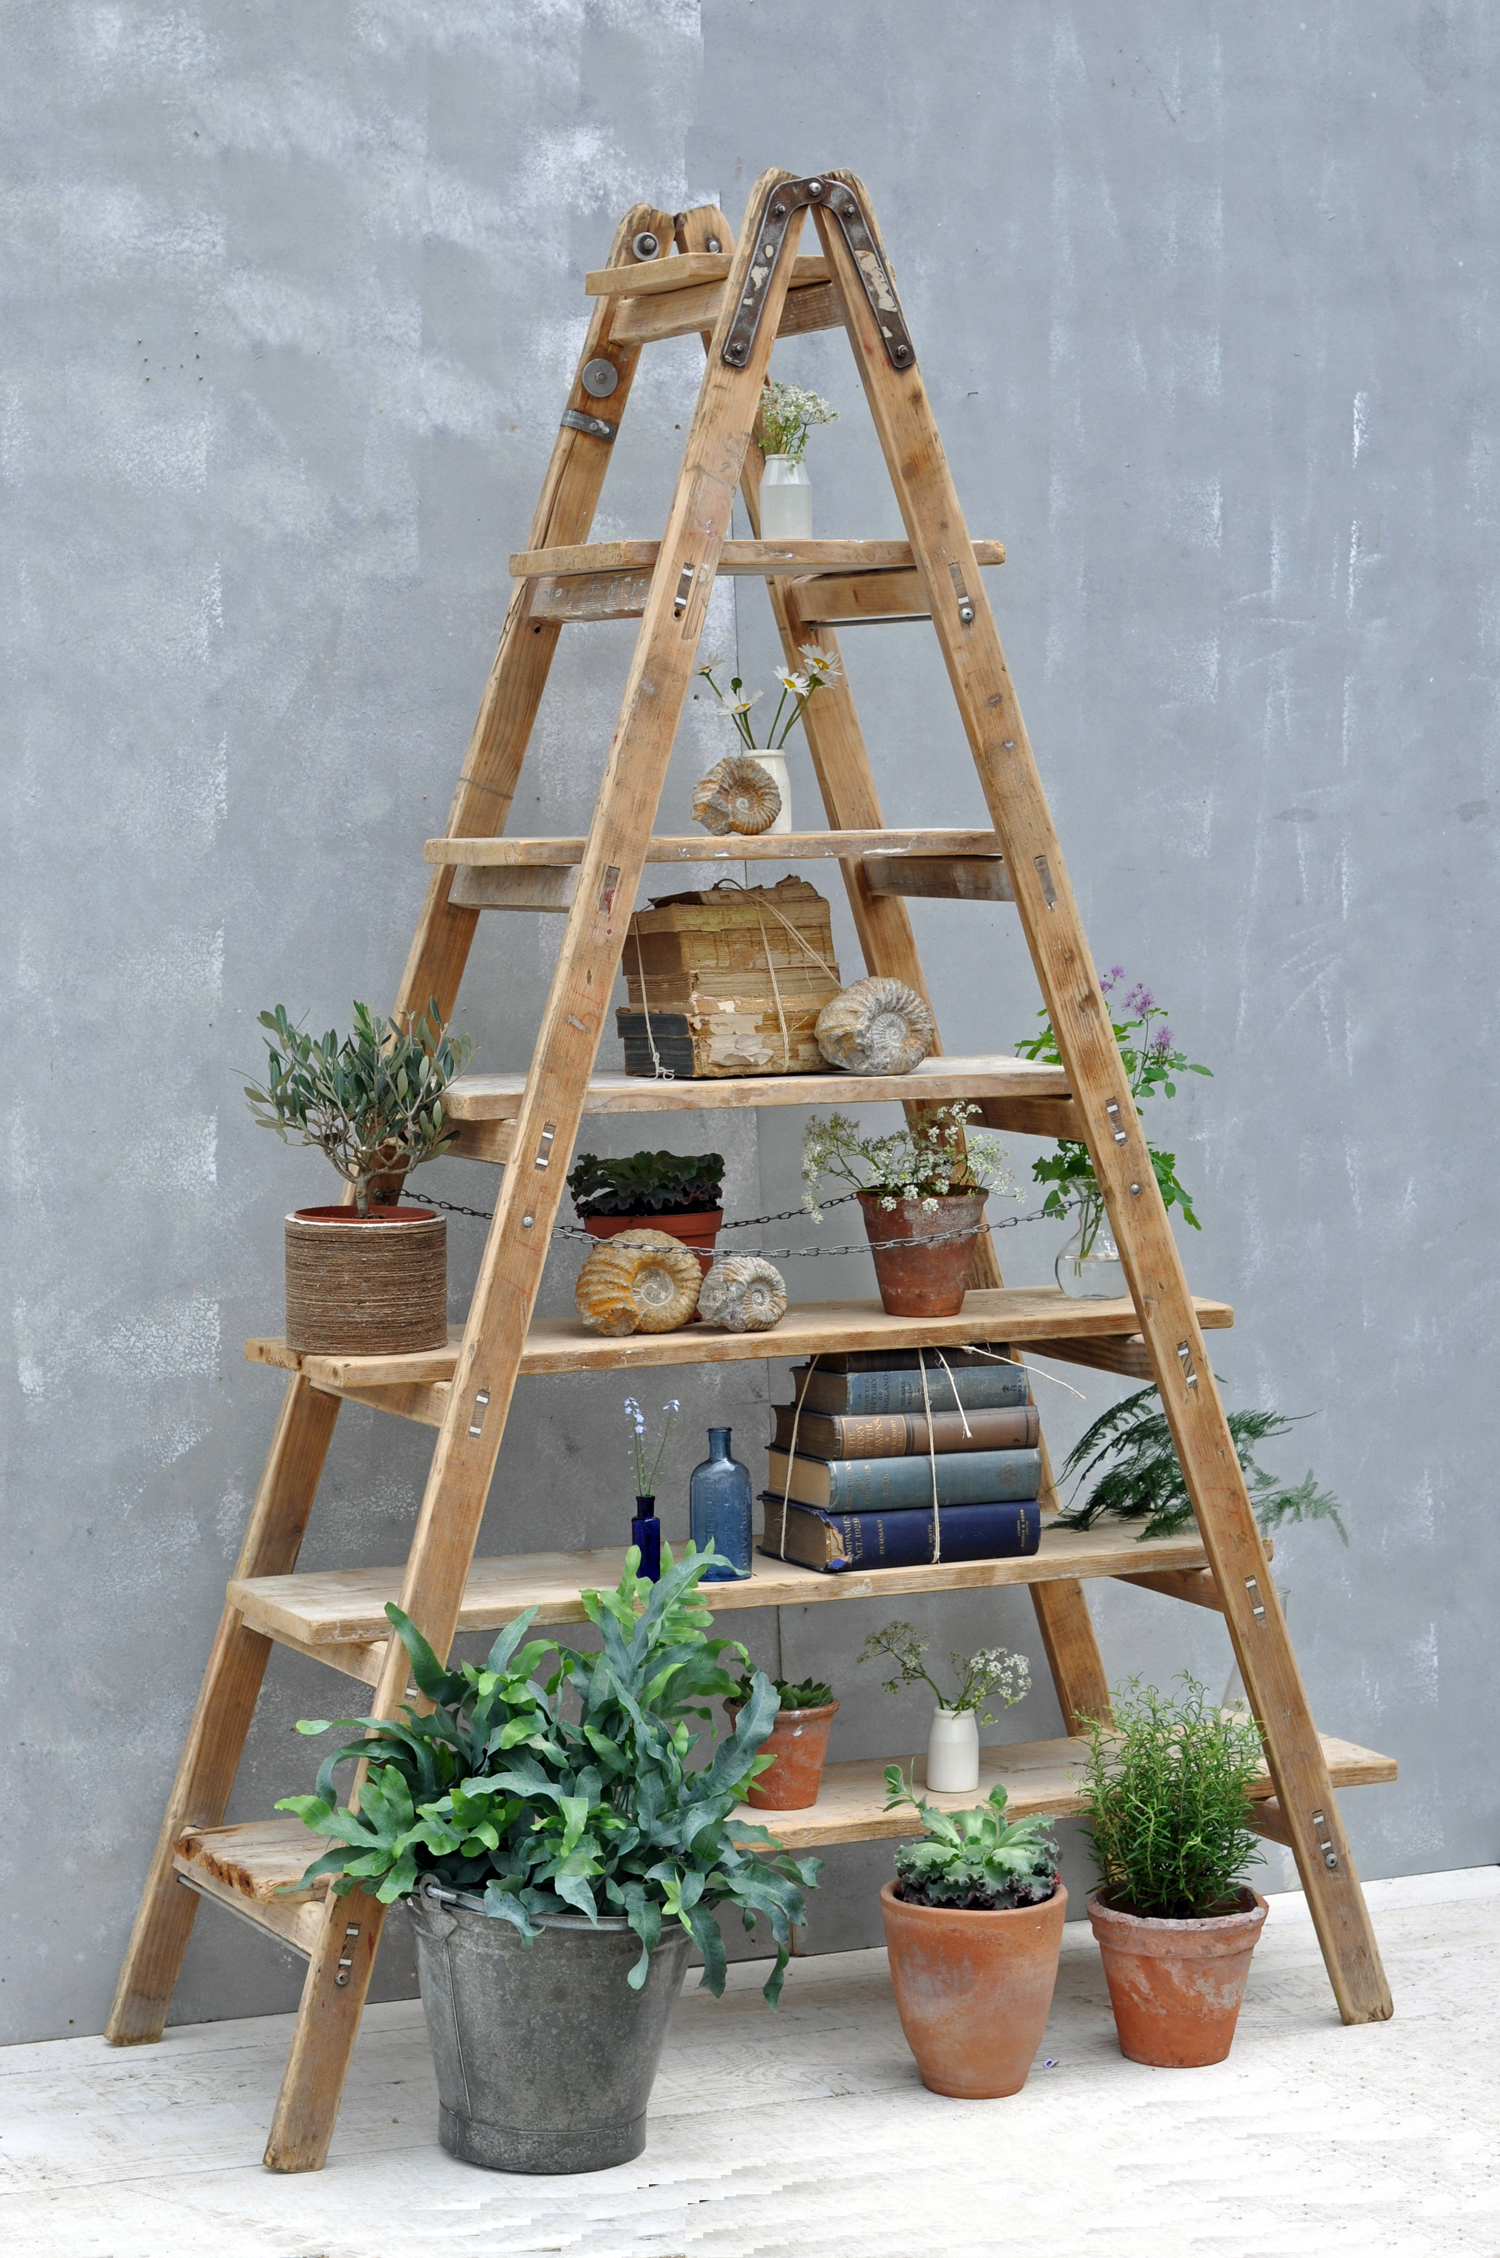 Vintage reclaimed ladder shelves rustic shelving for Decor ladder